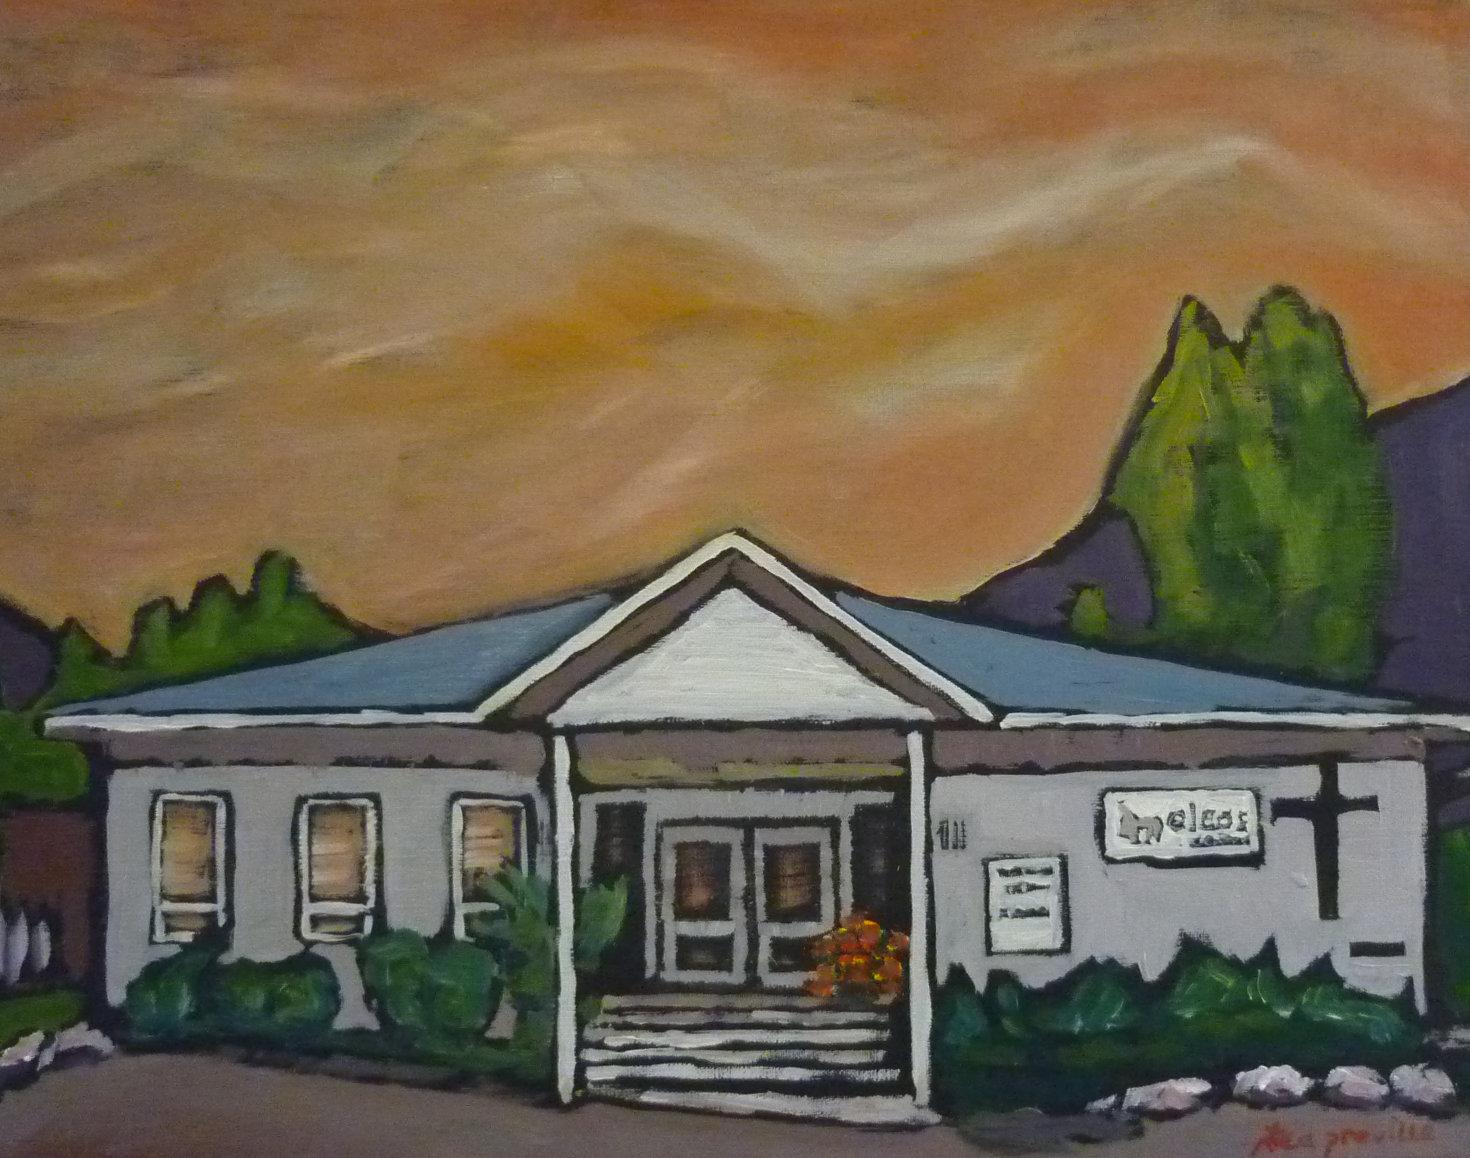 Eleos Centre Ministries Nelson, BC by Tea Preville